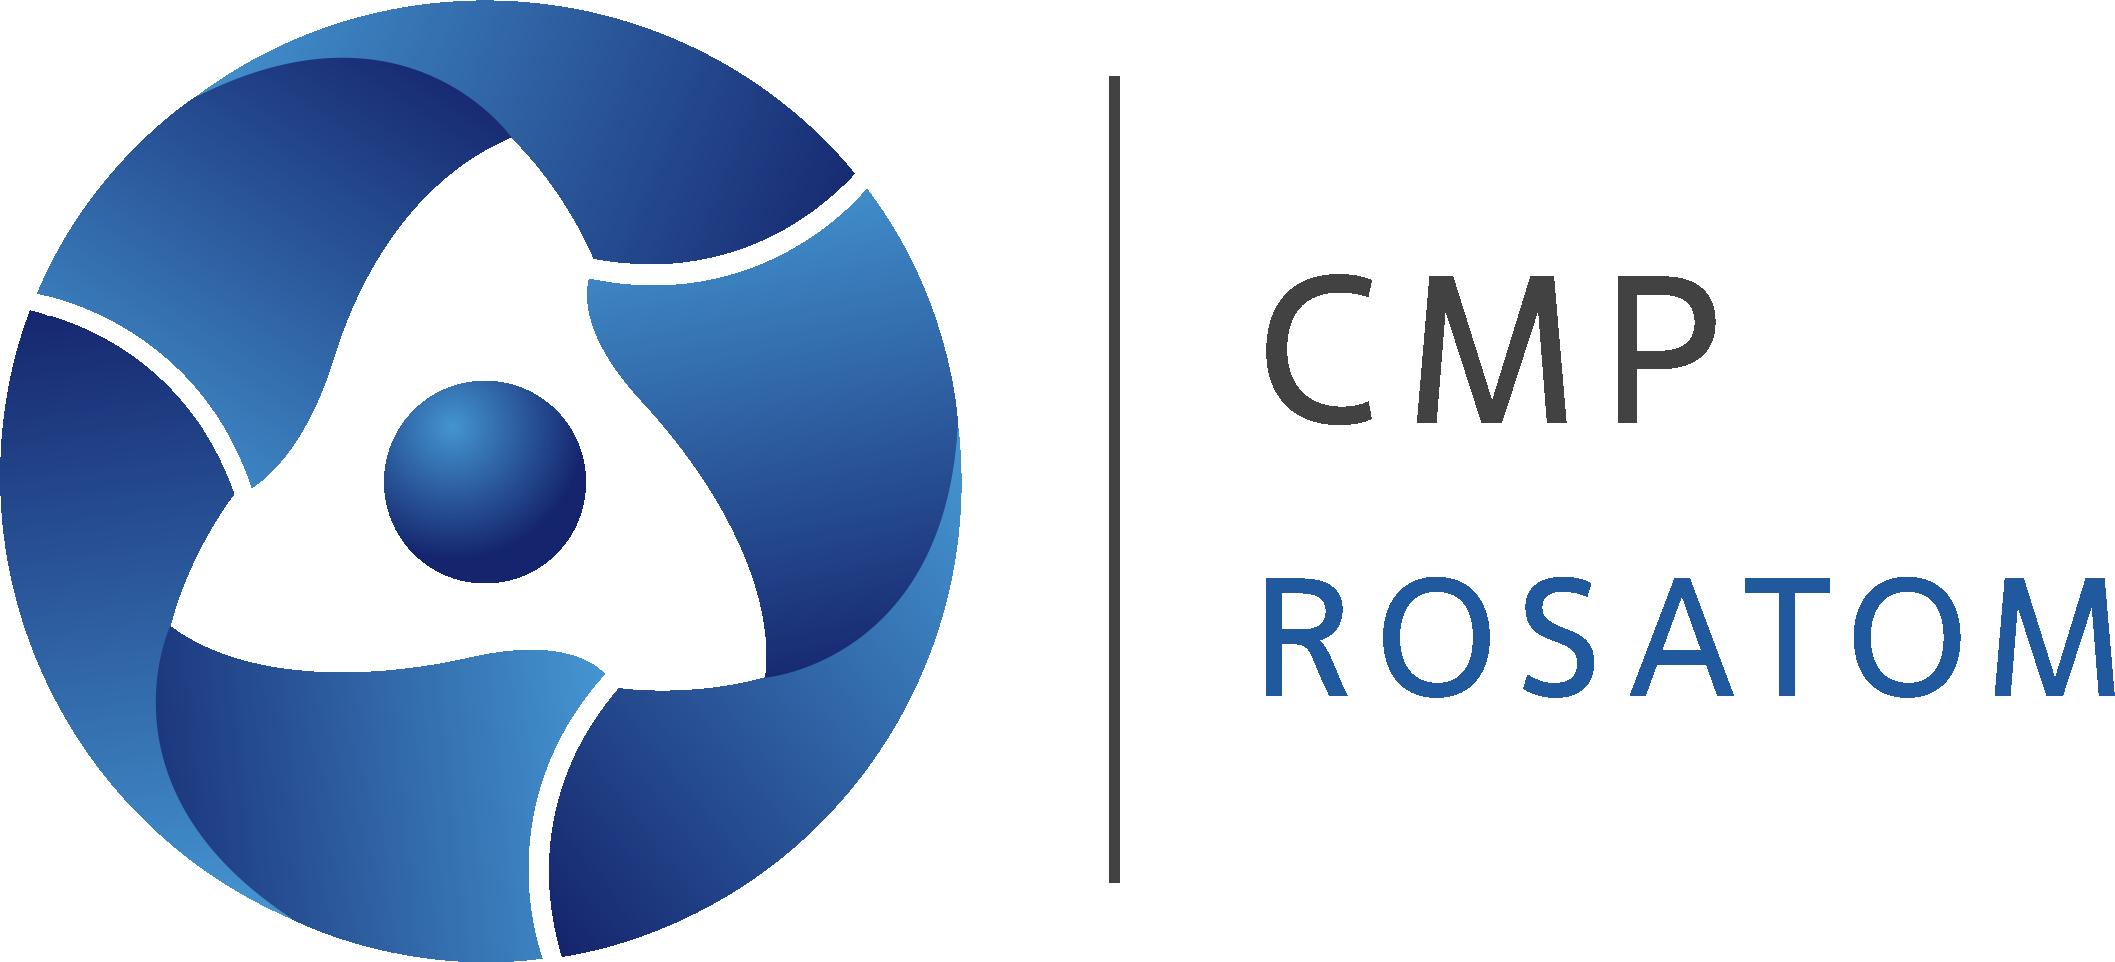 CMP - Chepetsky Mekanik Fabrikası